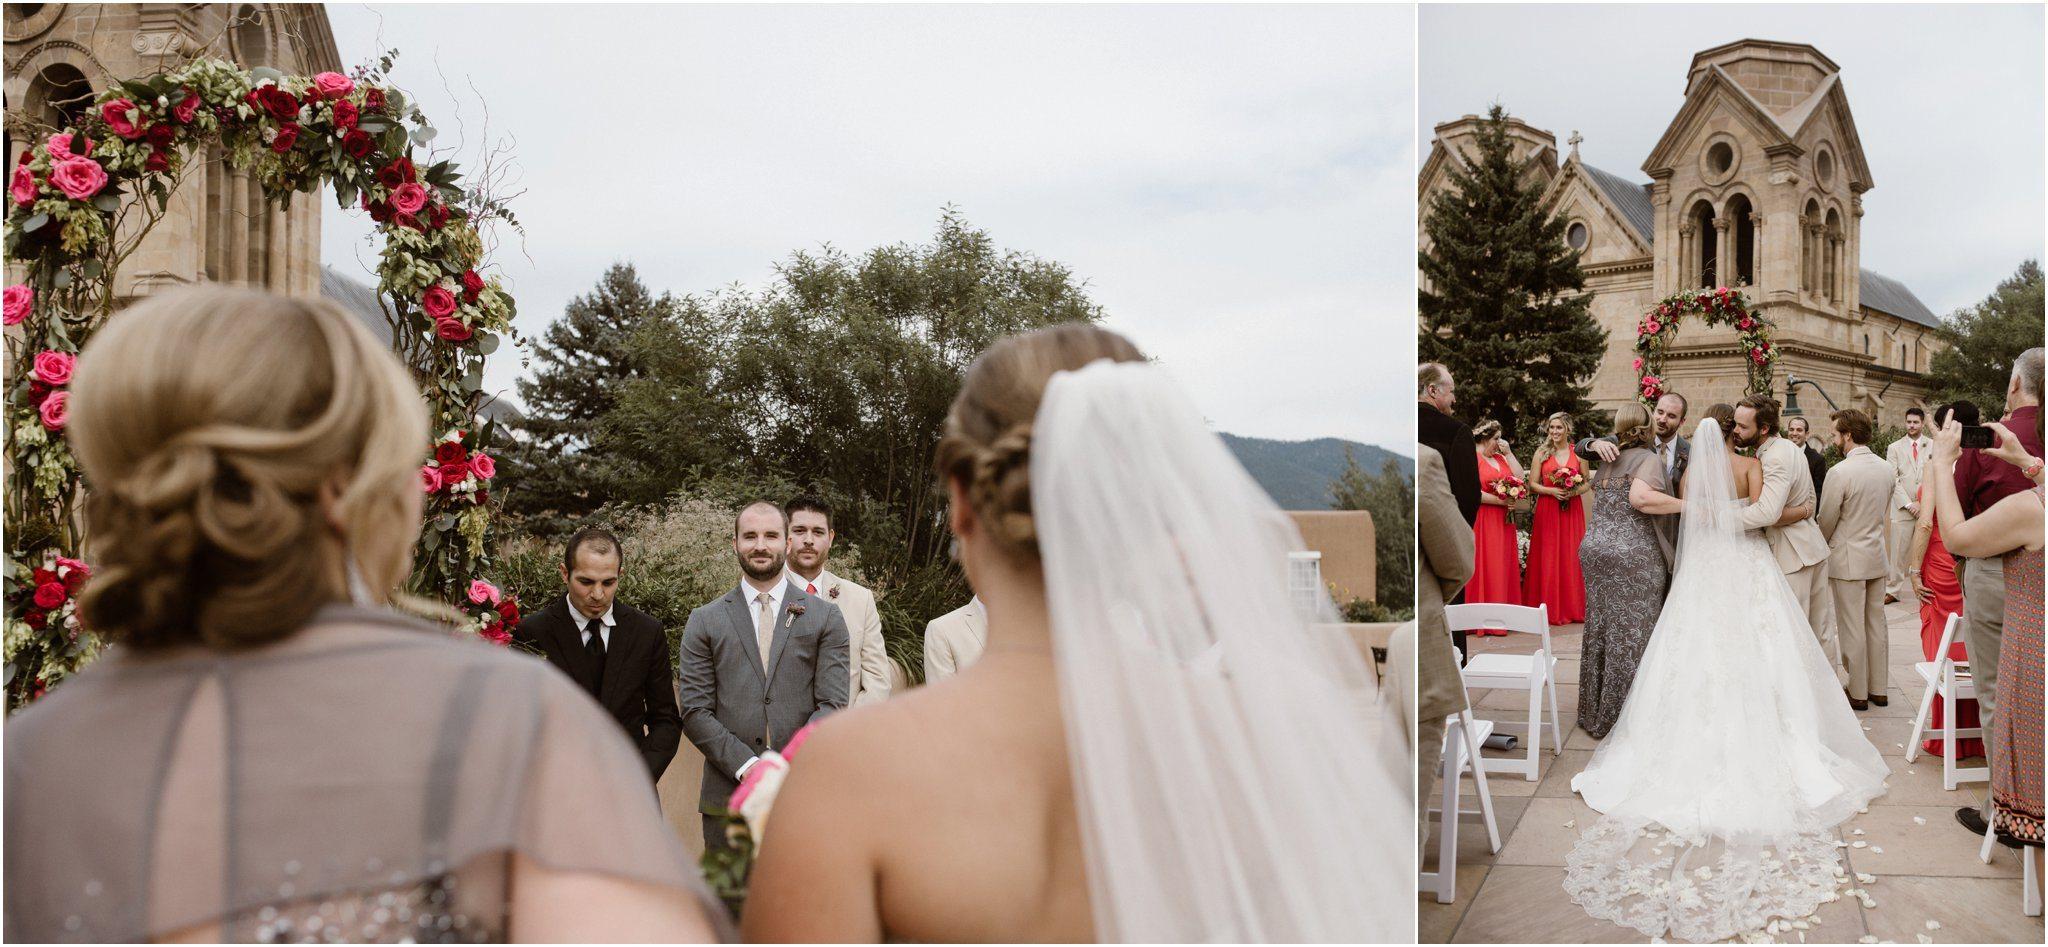 0035albuquerque-wedding-photographer_-santa-fe-wedding-photographer_-southwest-wedding-photography_-blue-rose-studio